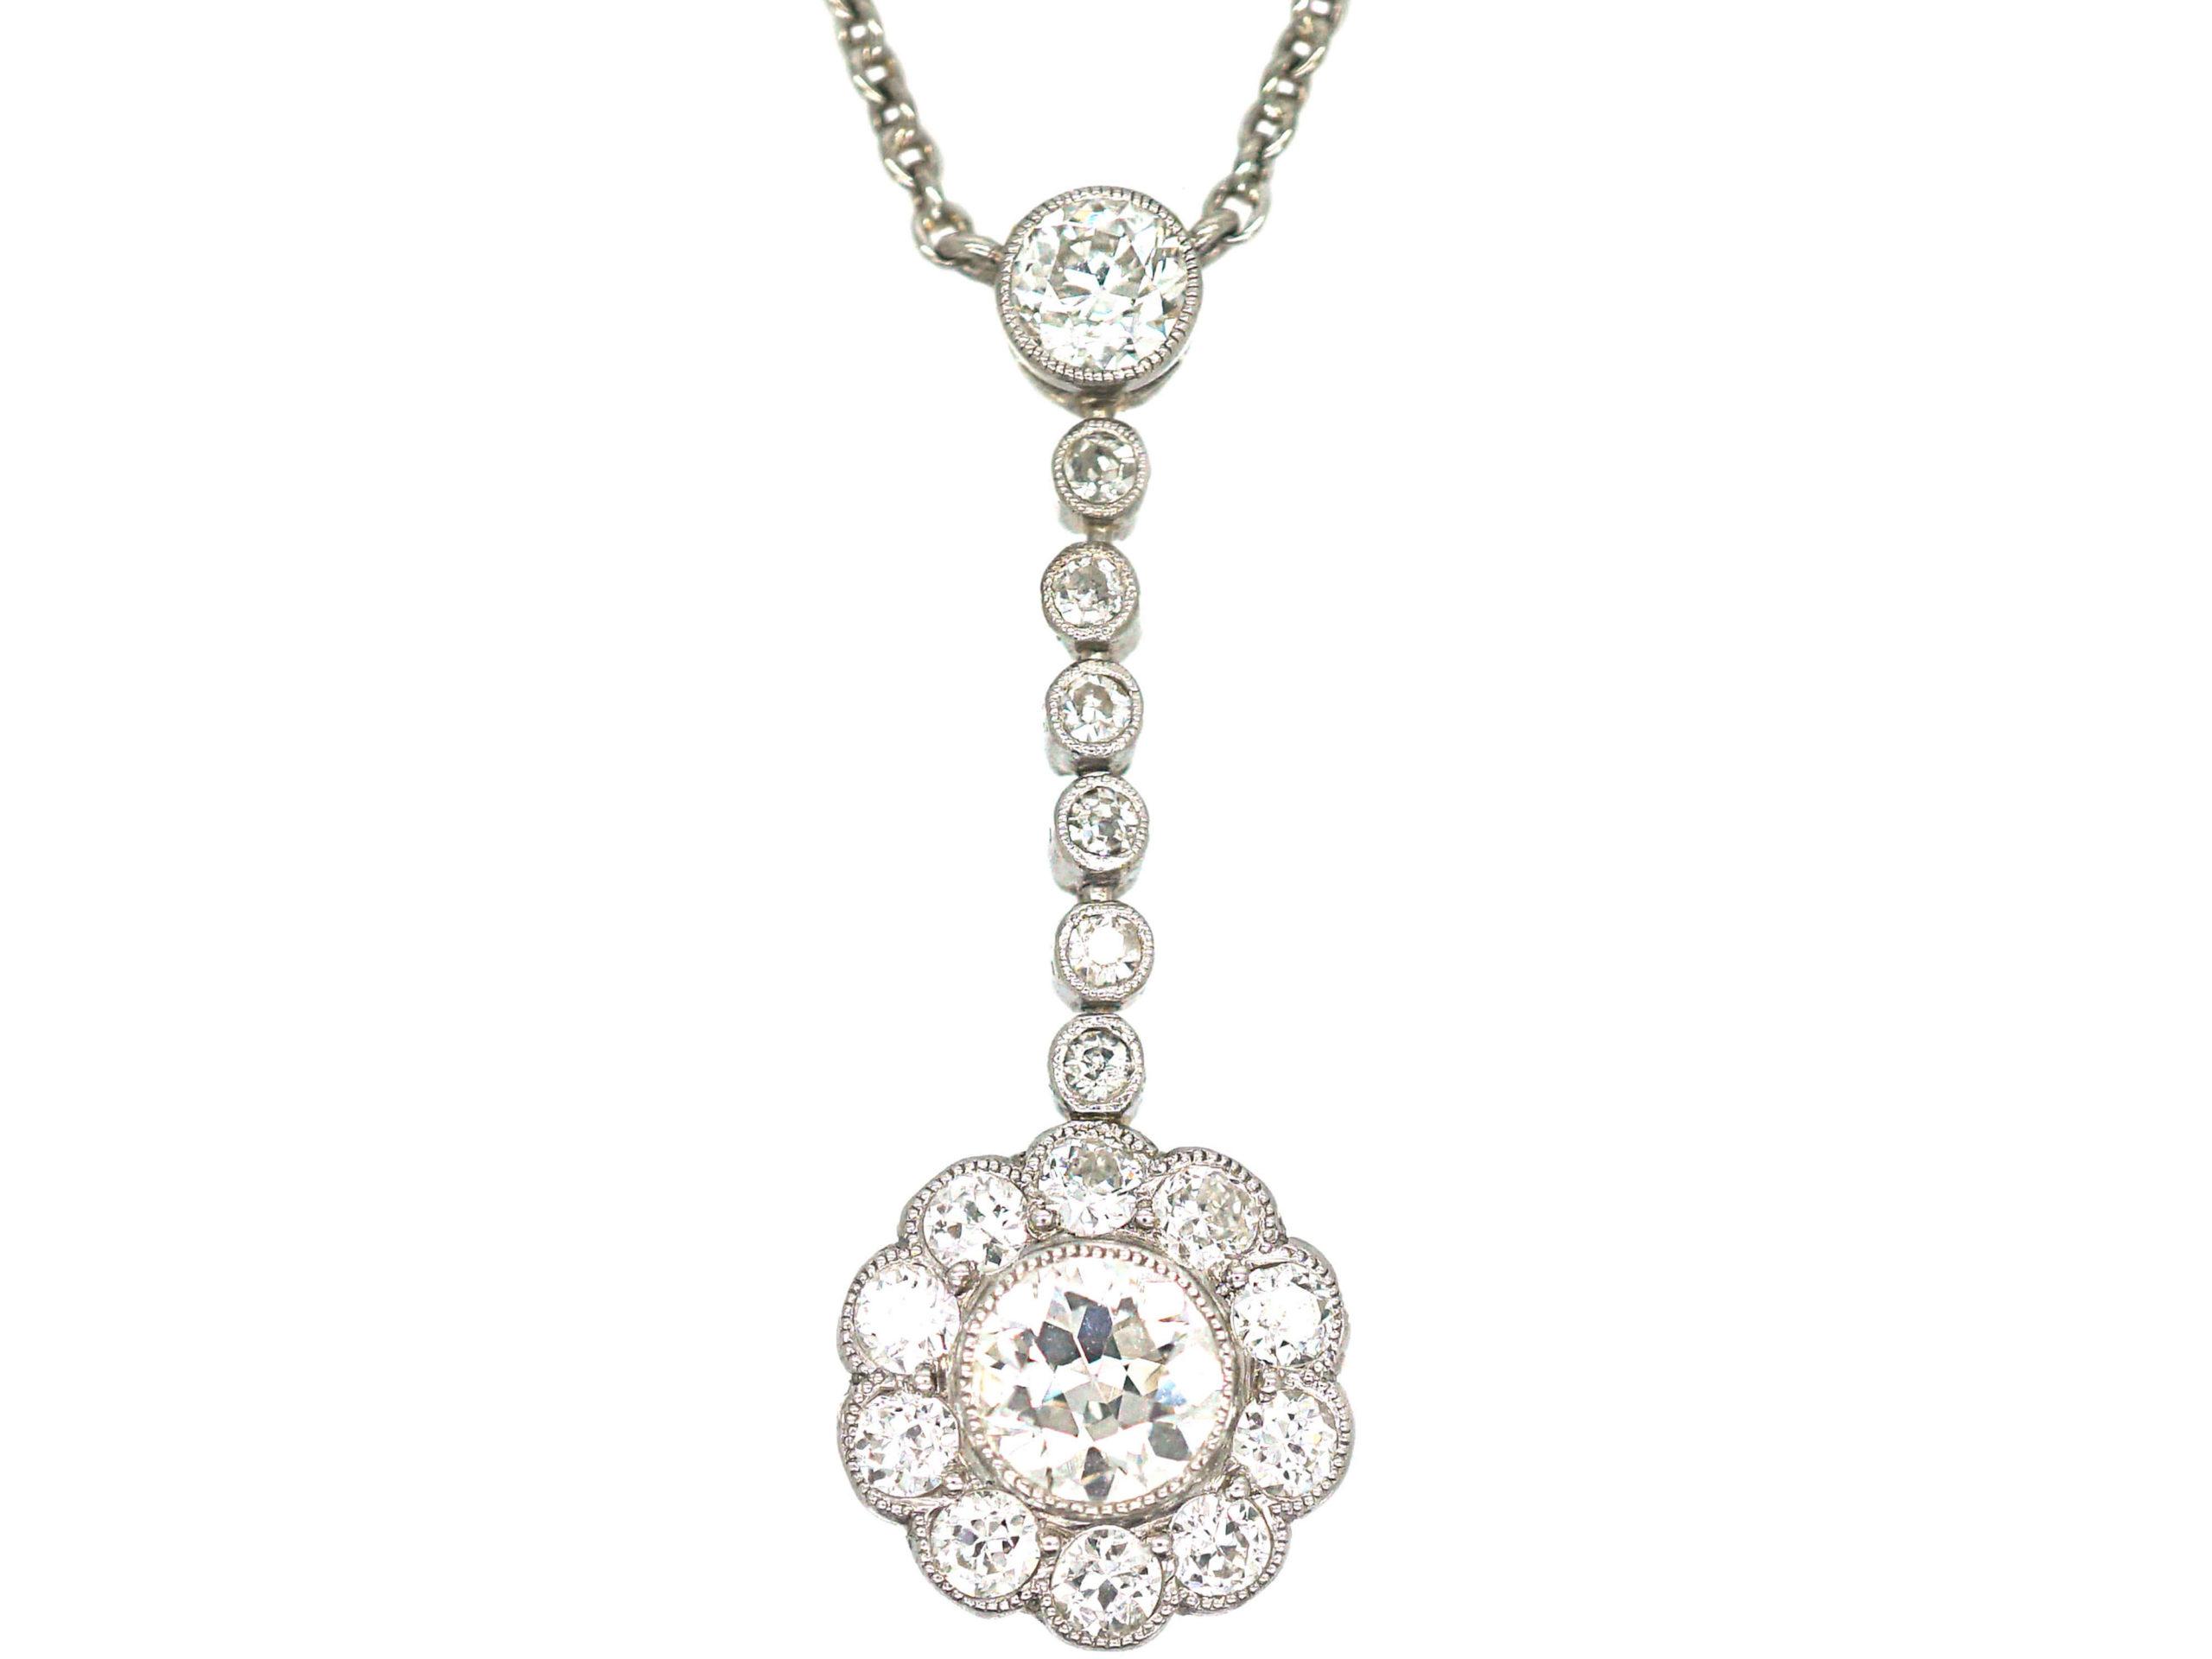 Edwardian Platinum & Diamond Cluster Pendant on Platinum Chain